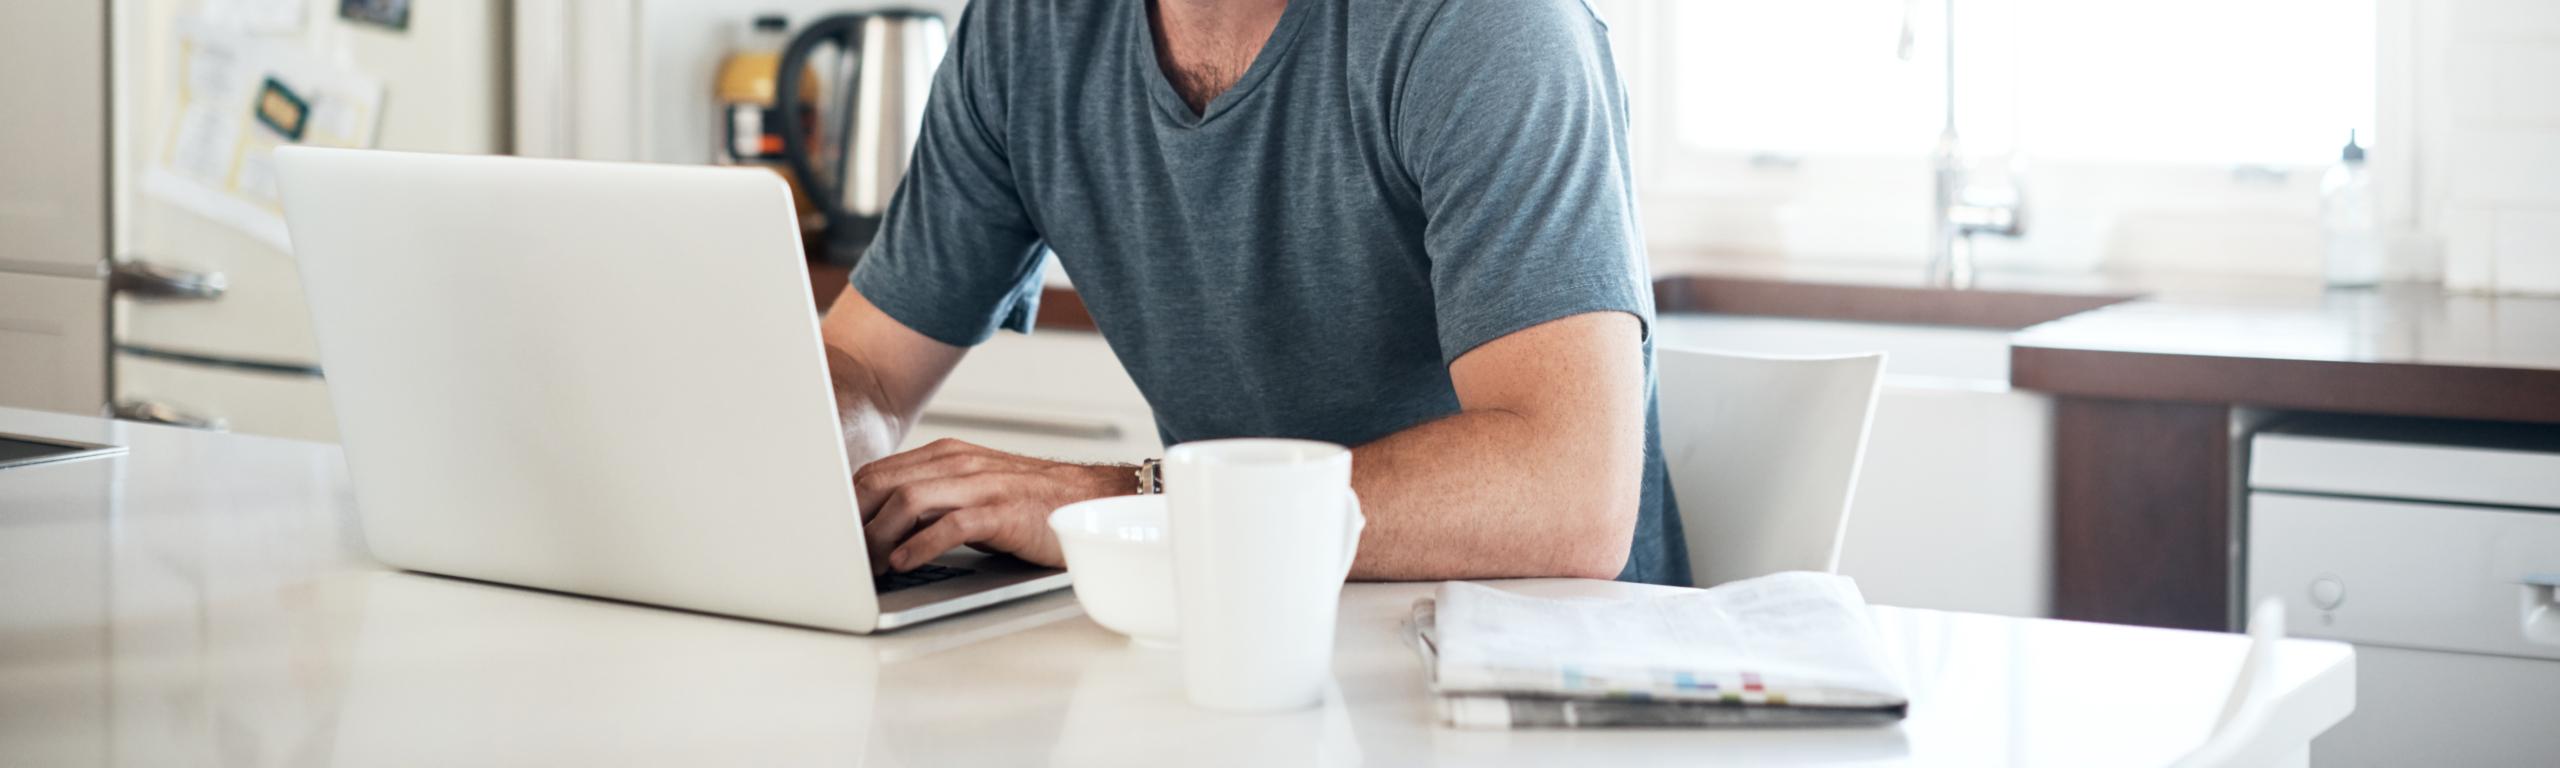 Online e-læring om IHC